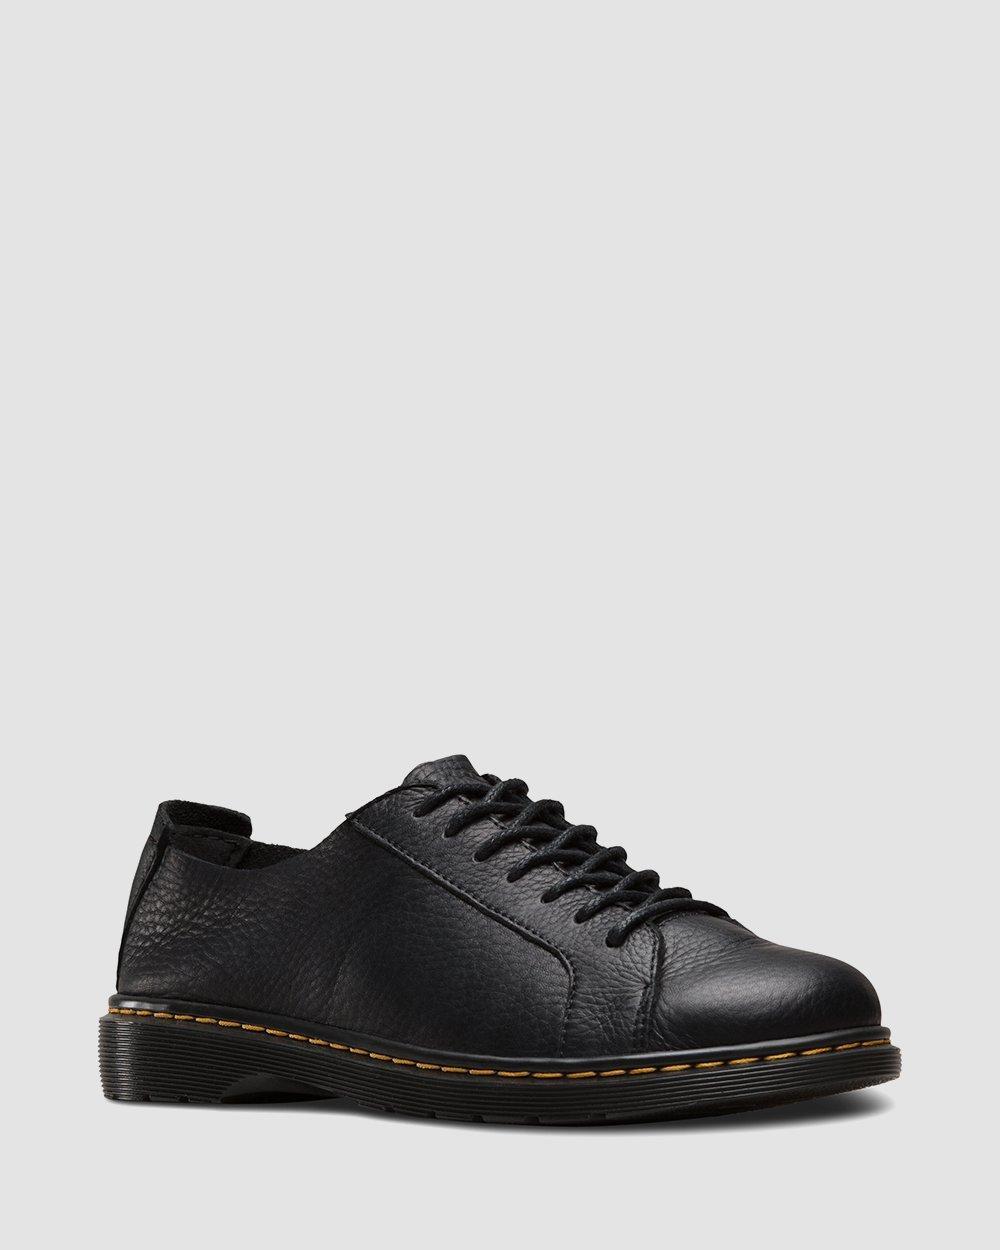 Dr. Martens Men's Shoes Mens Shoes Dr. Martens Islip Eye